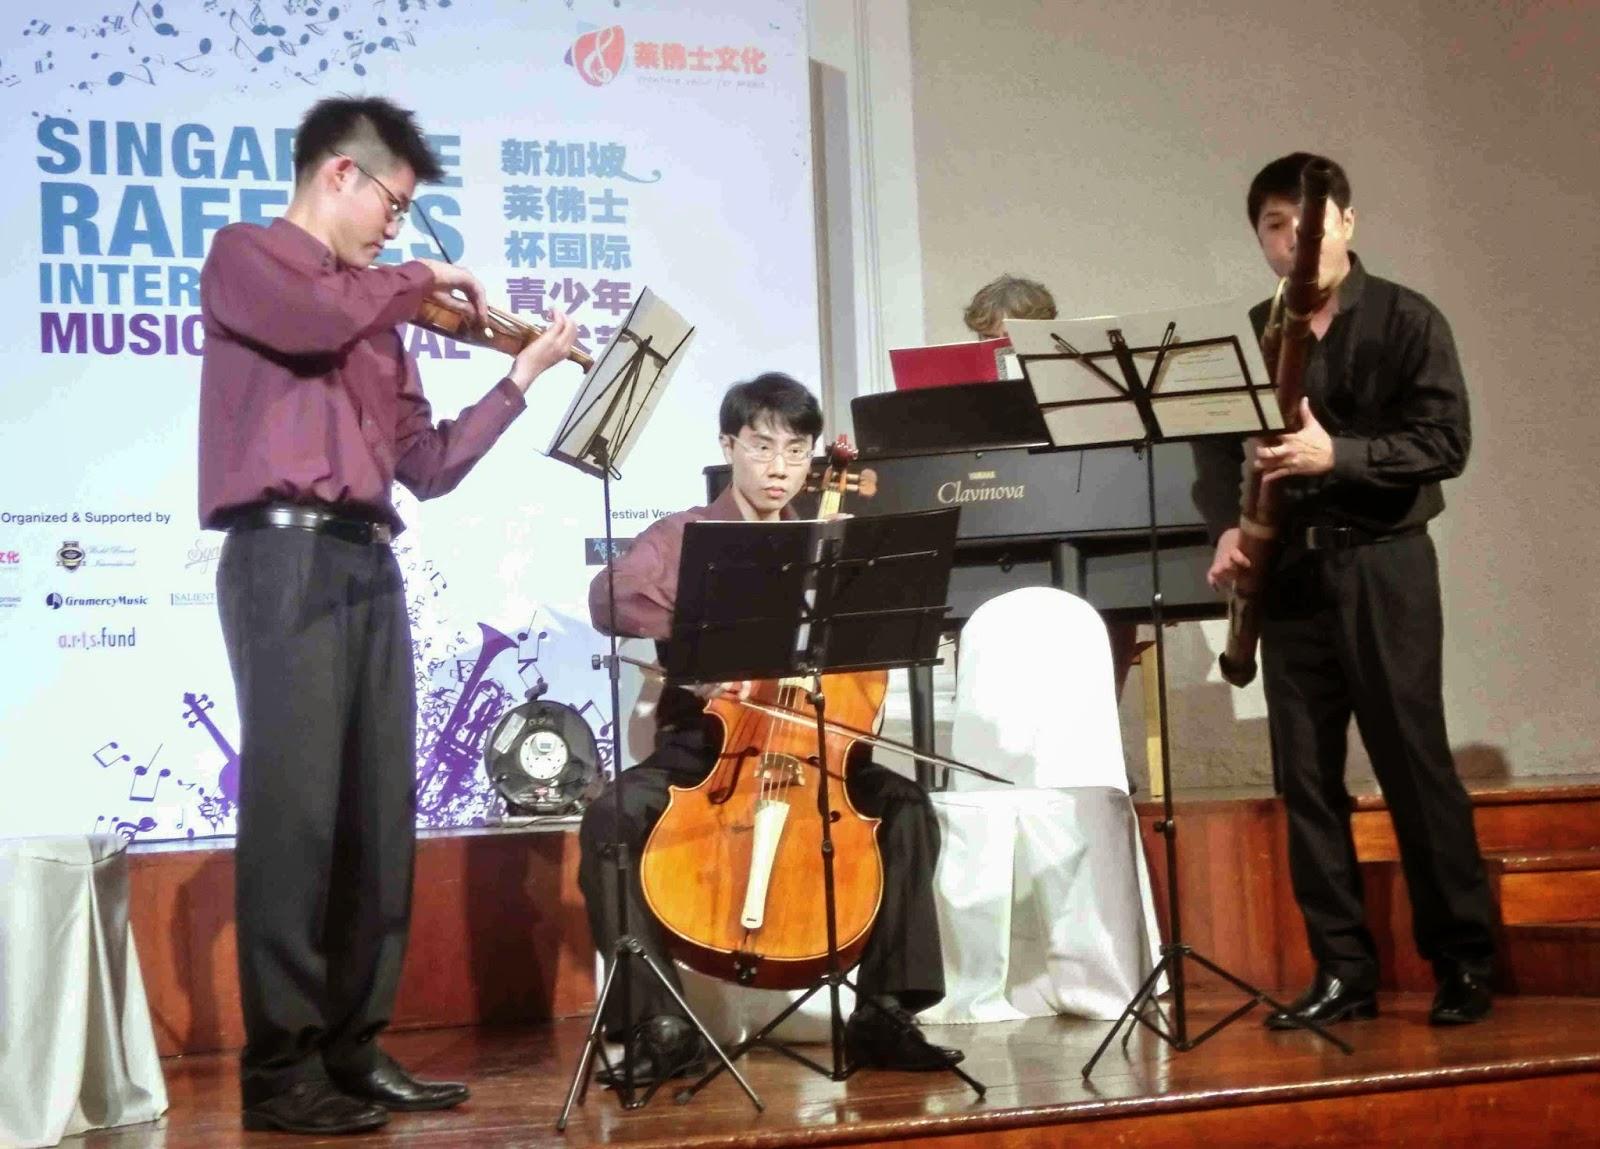 pianomania: VOICE OF CELLO & CHAMBER MUSIC NIGHT / Singapore Raffles